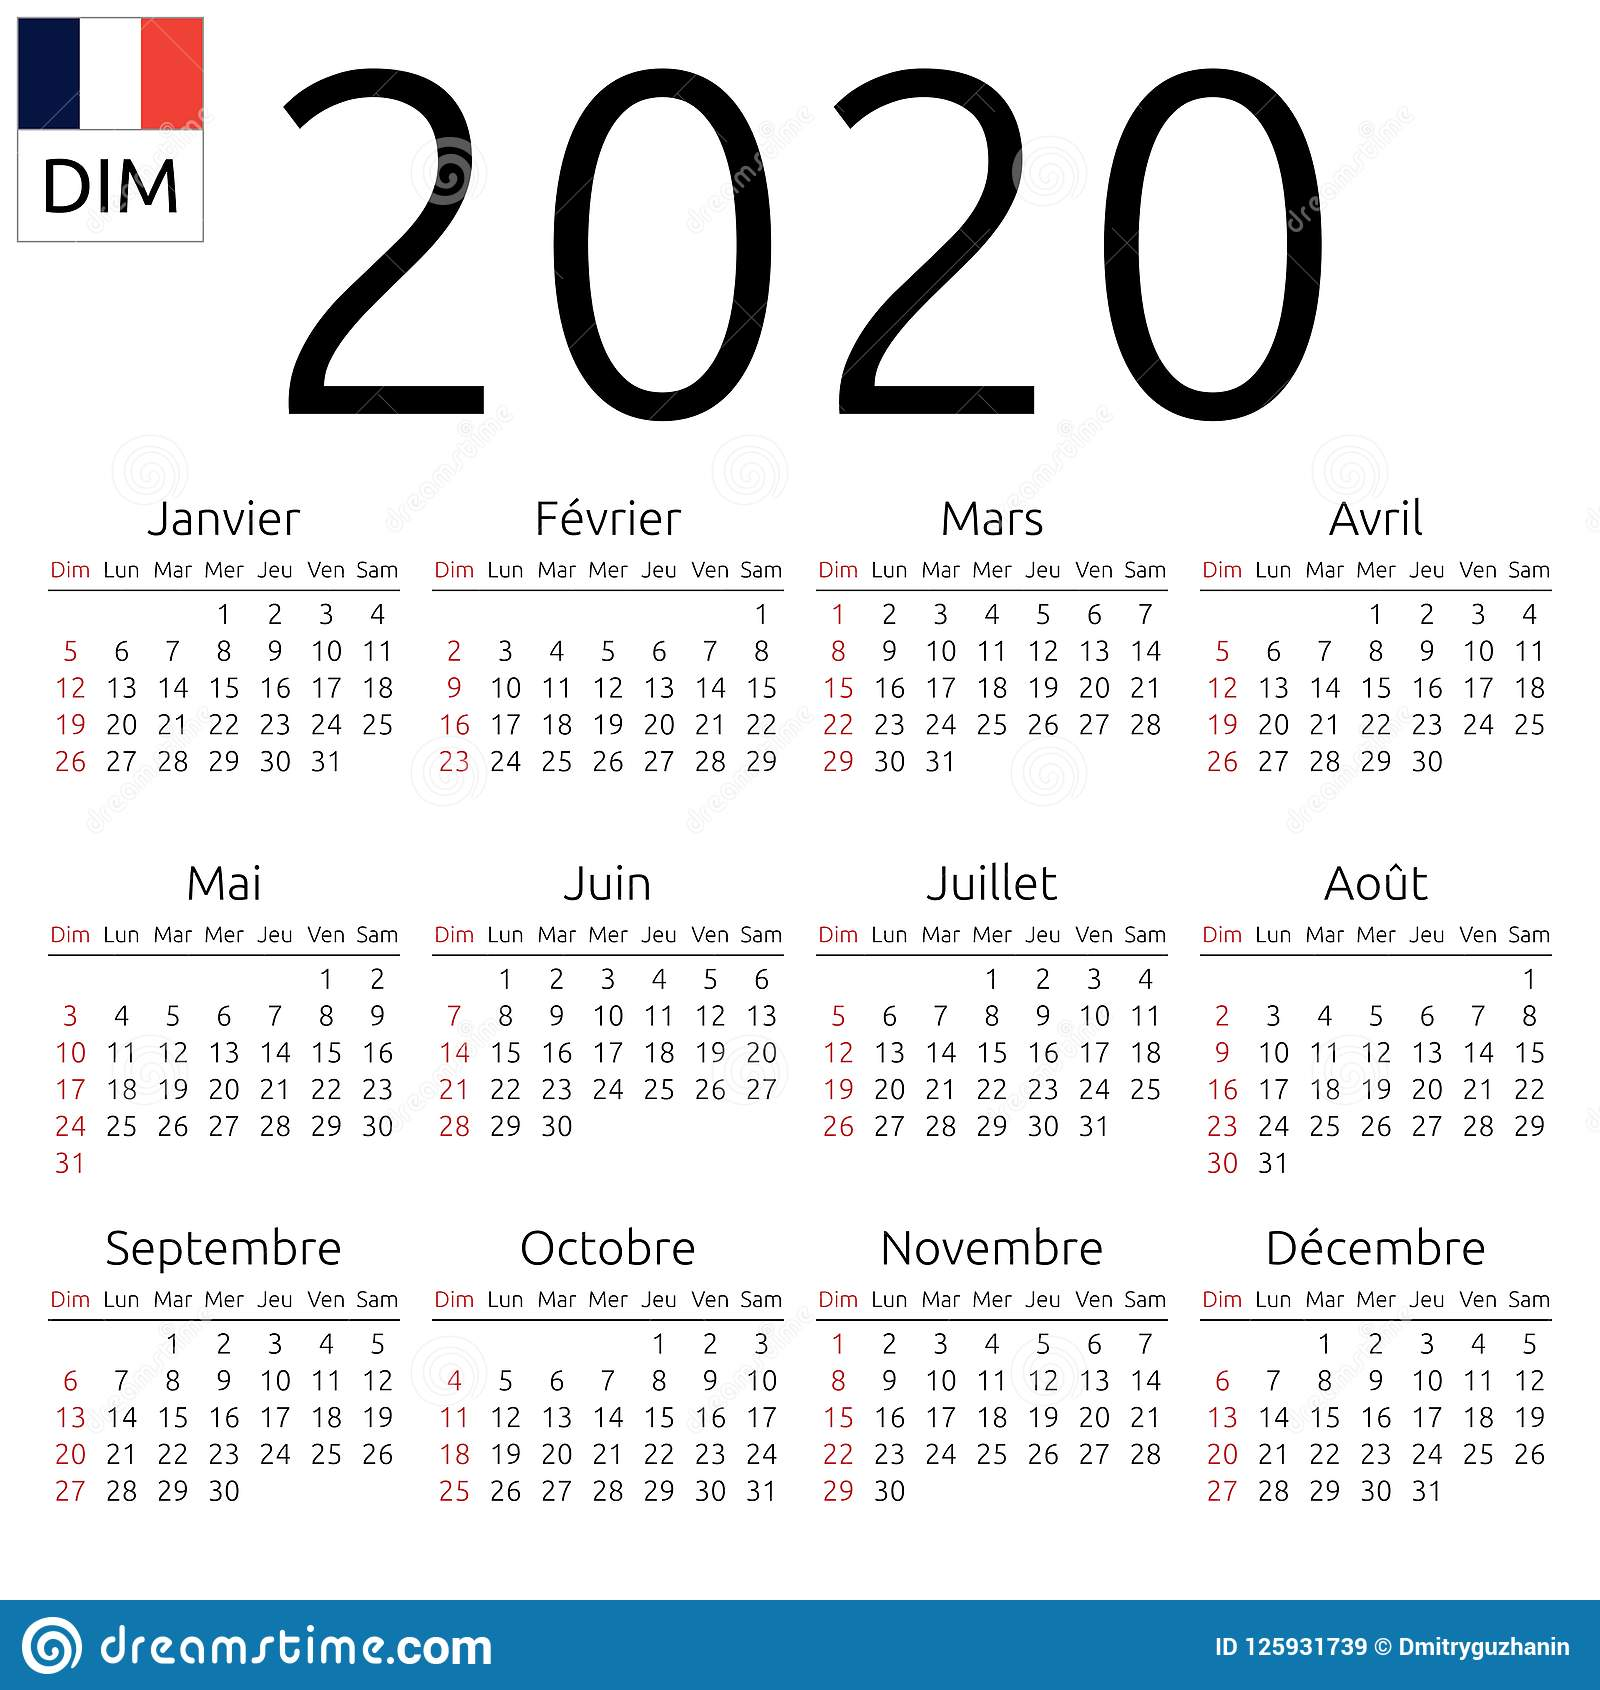 Calendario 2020 2020.Calendar 2020 French Sunday Stock Vector Illustration Of